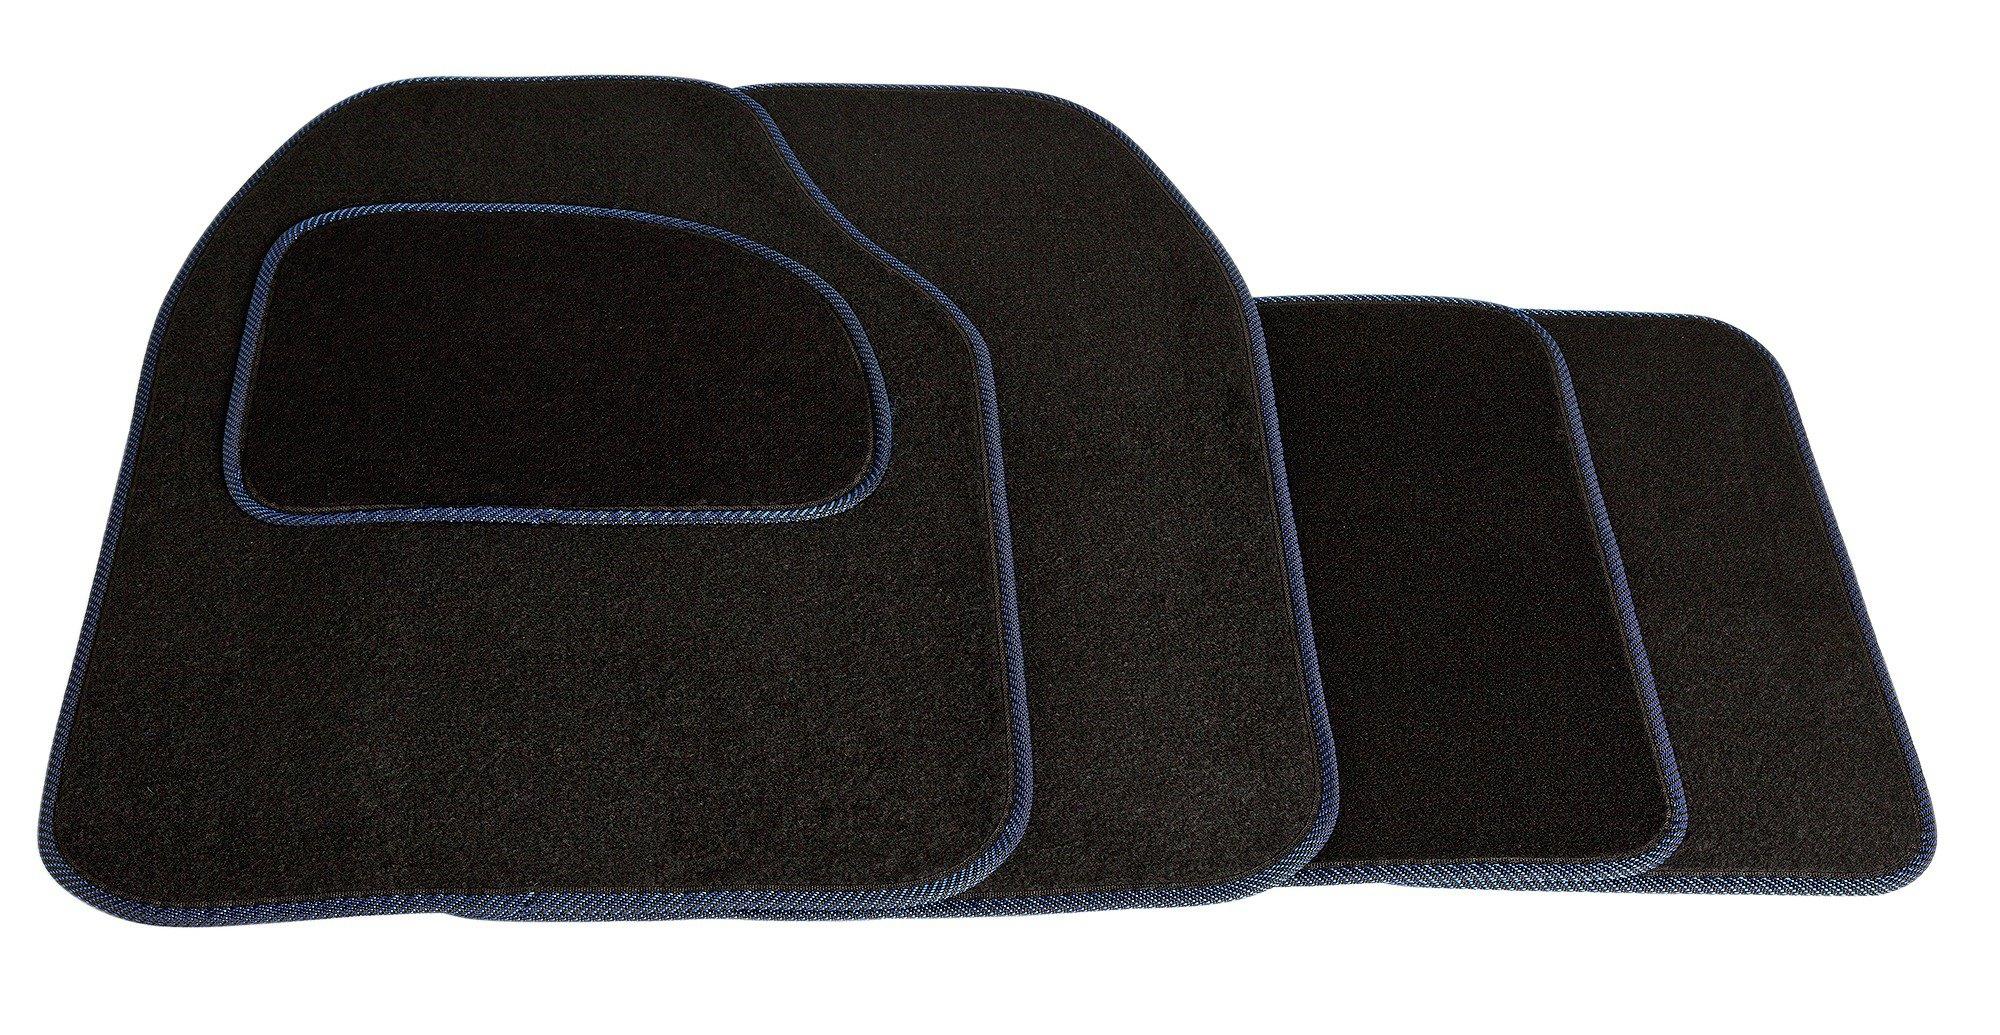 Streetwize Set of 4 Car Mats - Black with Blue Trim